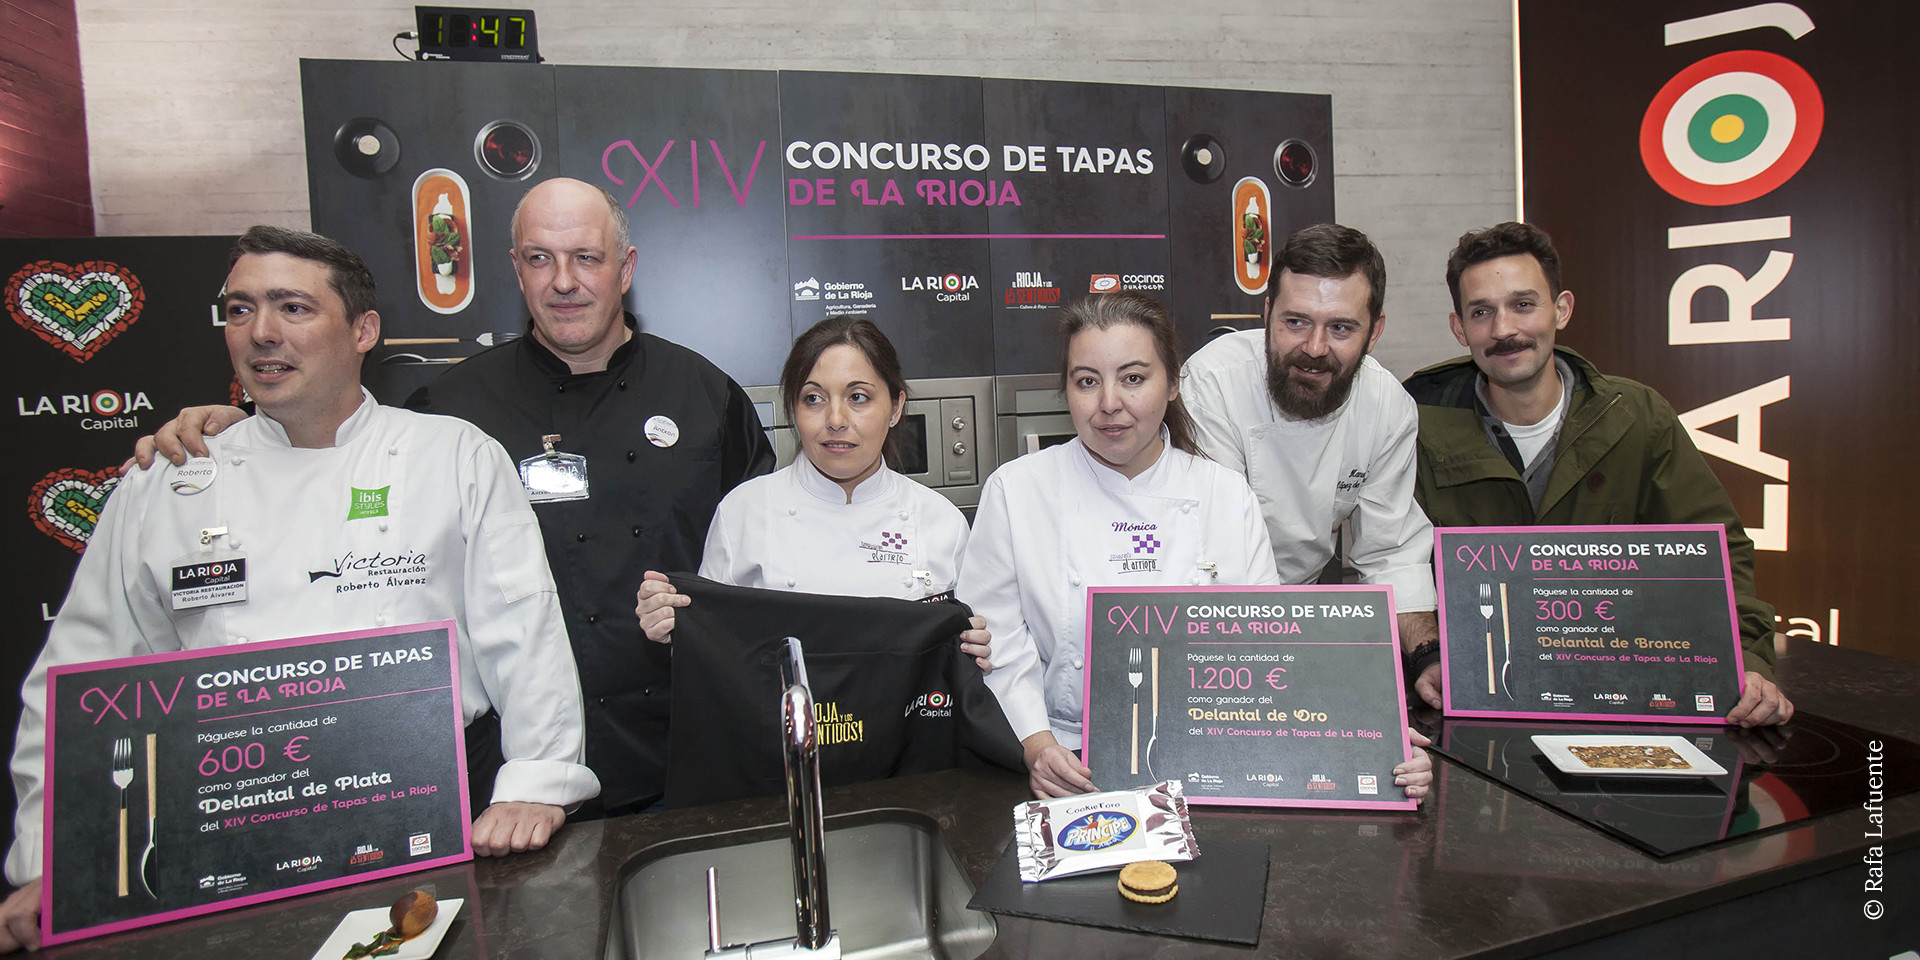 Diseño diplomas XIV concurso de tapas de La Rioja